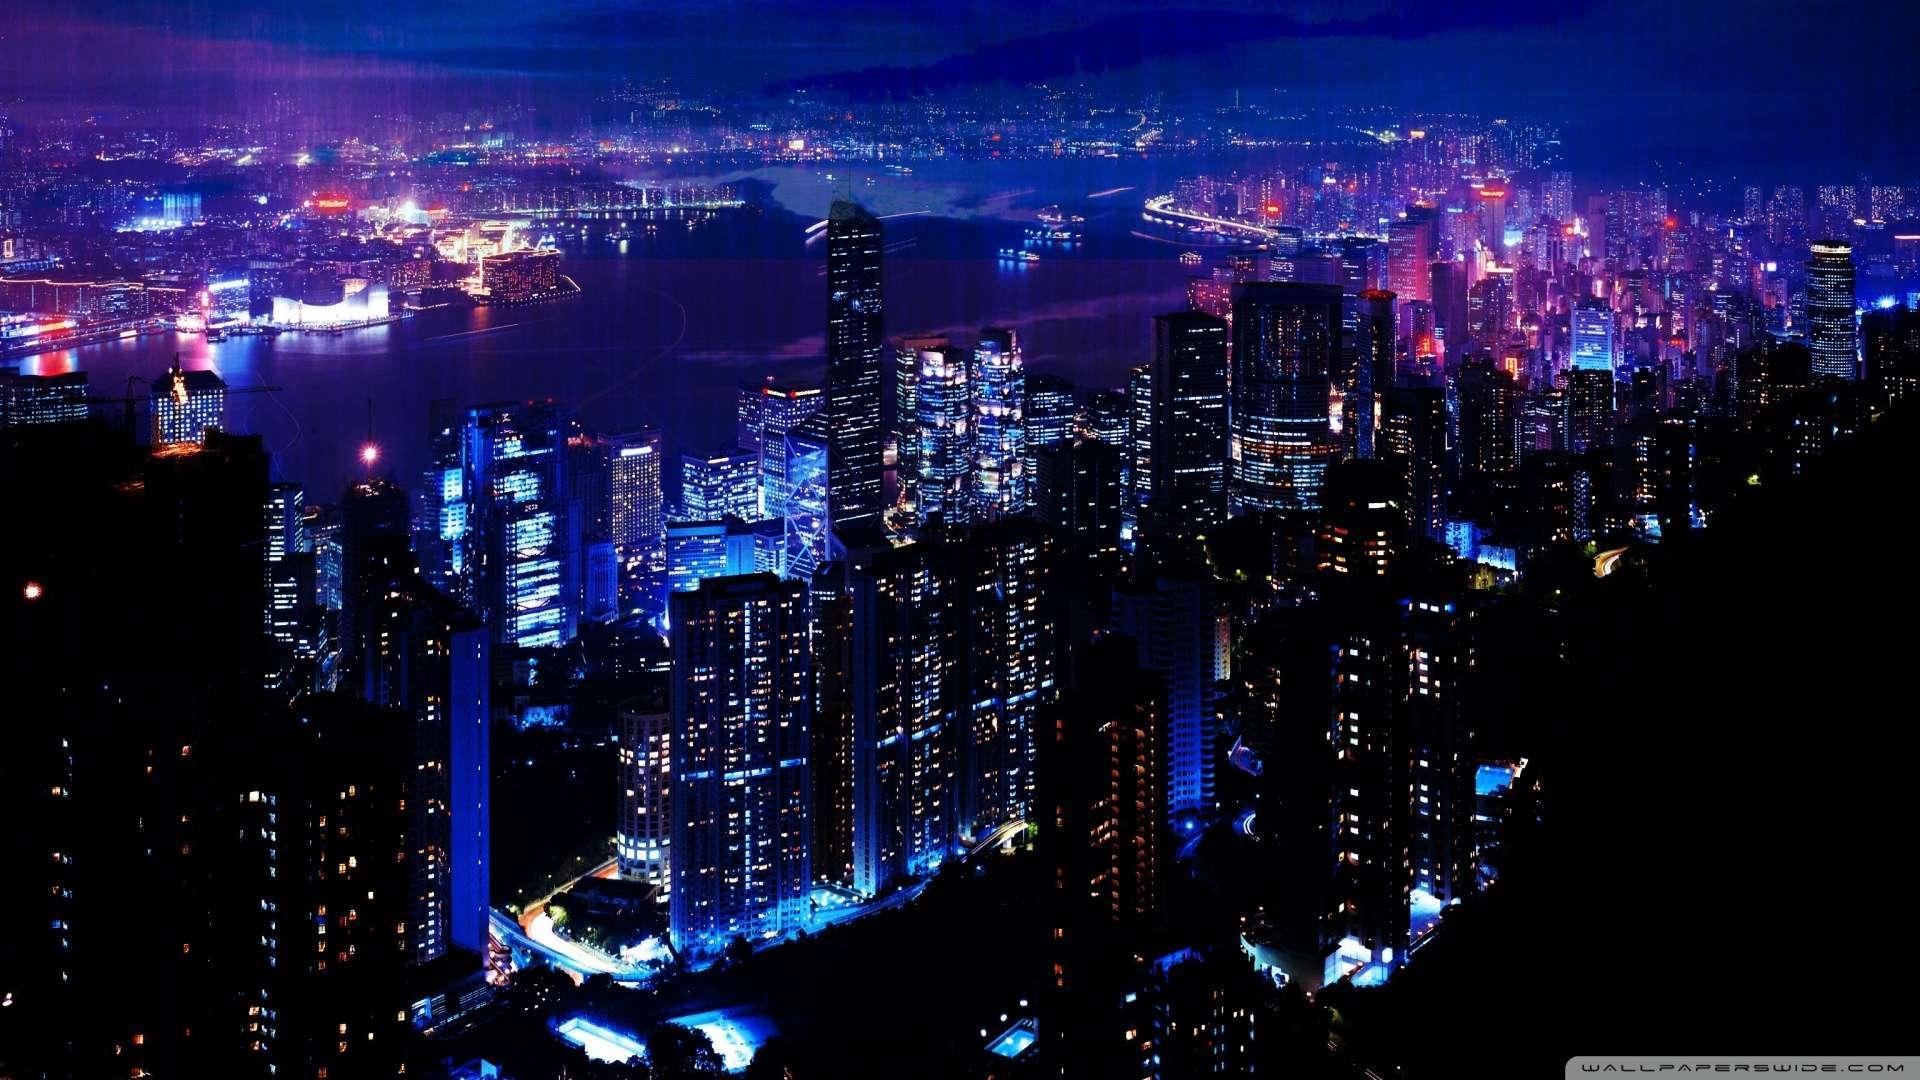 Wallpaper Night City 2 Wallpaper 1080p HD Upload at January 4 2014 1920x1080